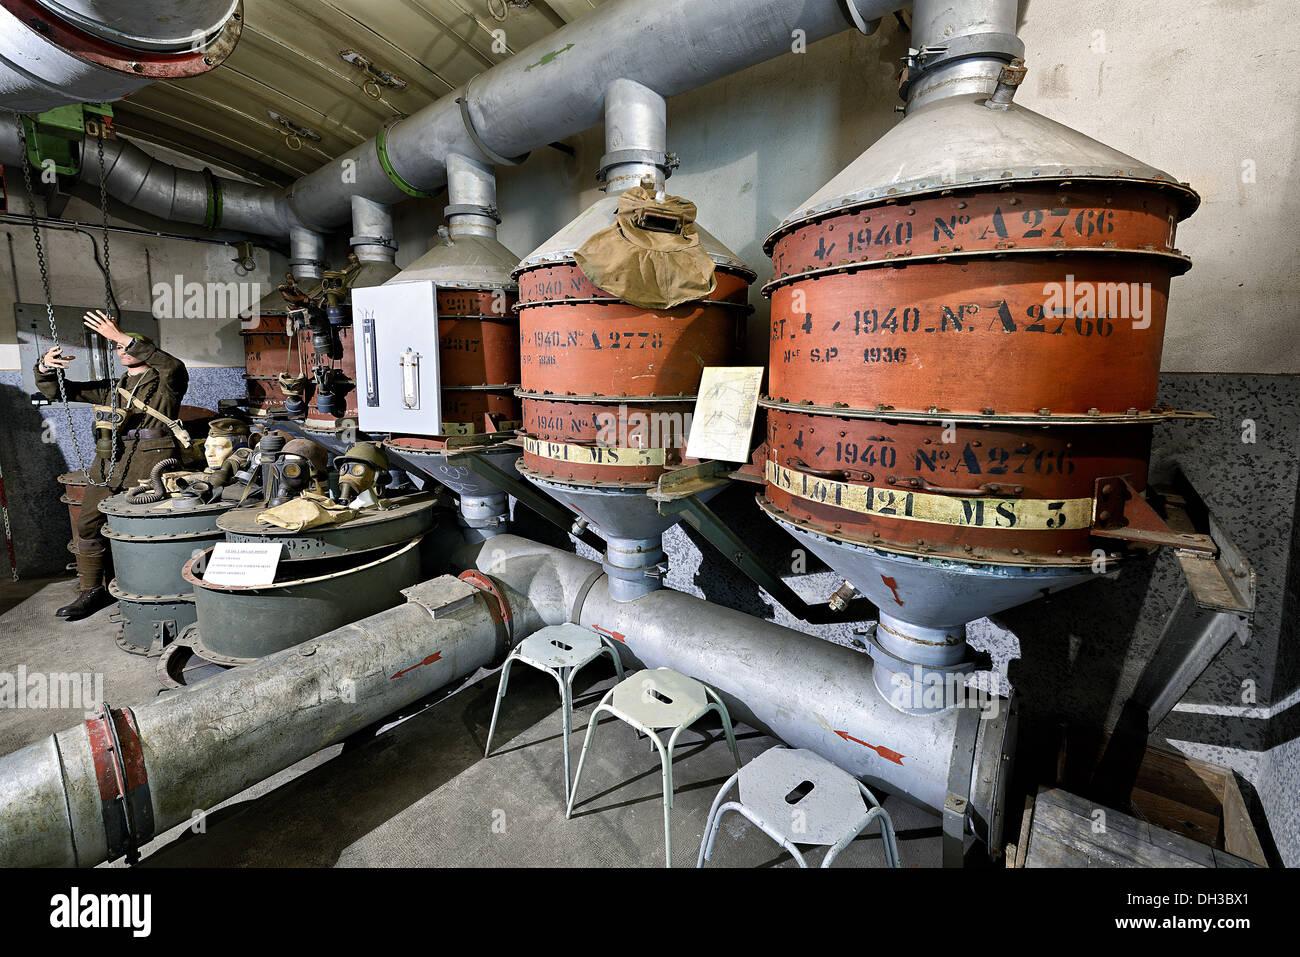 Filters room, Zeiterholz shelter, Maginot line. - Stock Image